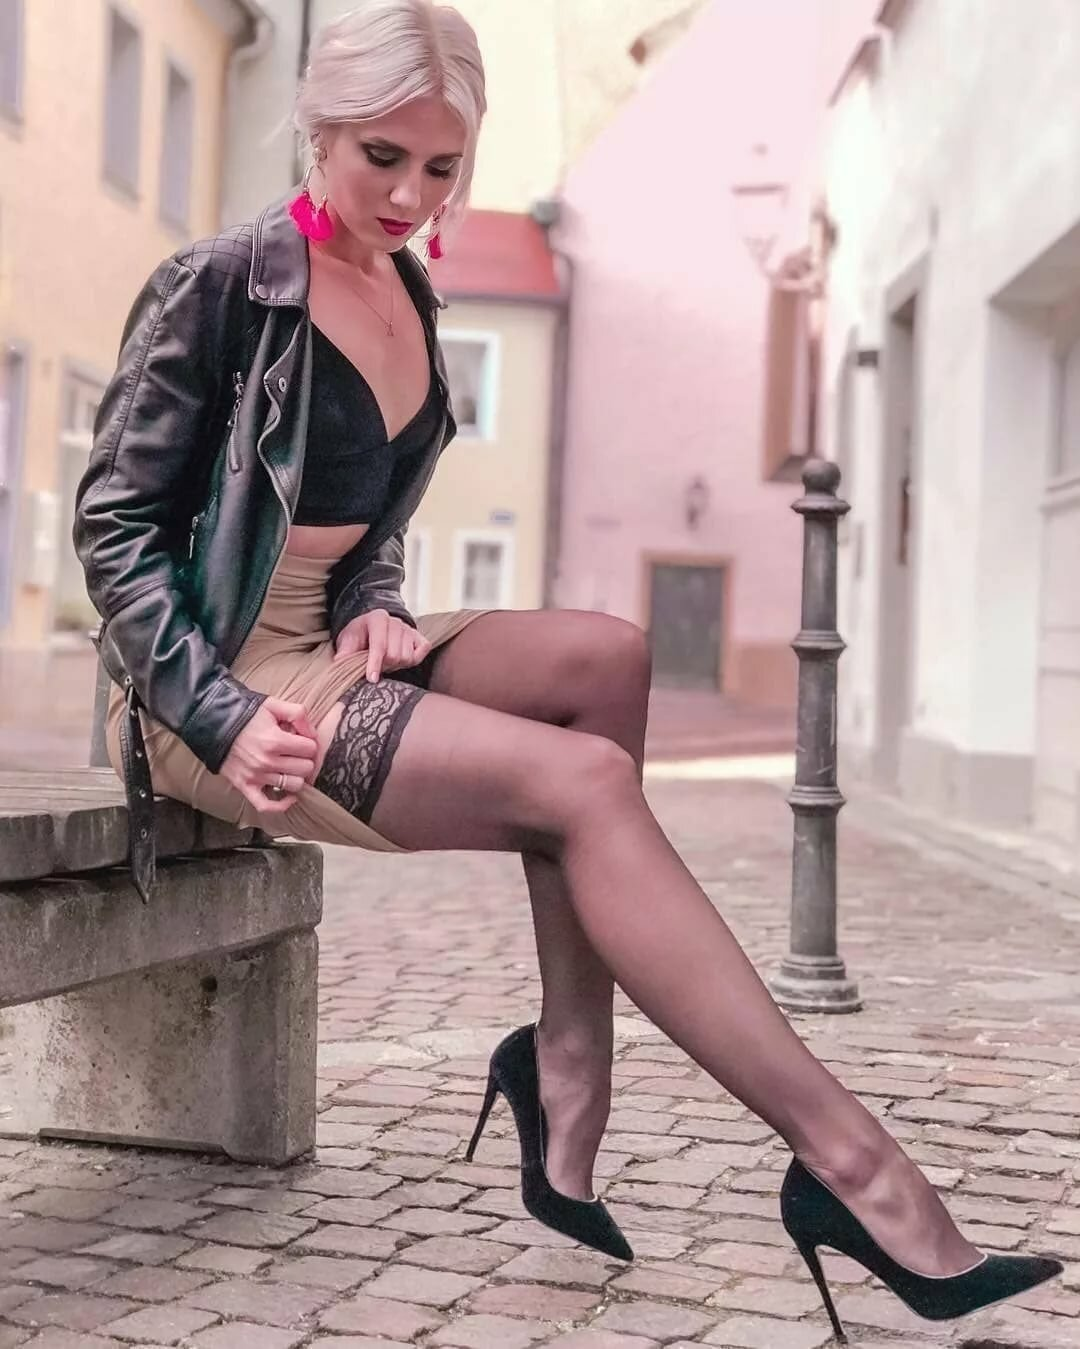 Фото шлюх на высоких каблуках — pic 6